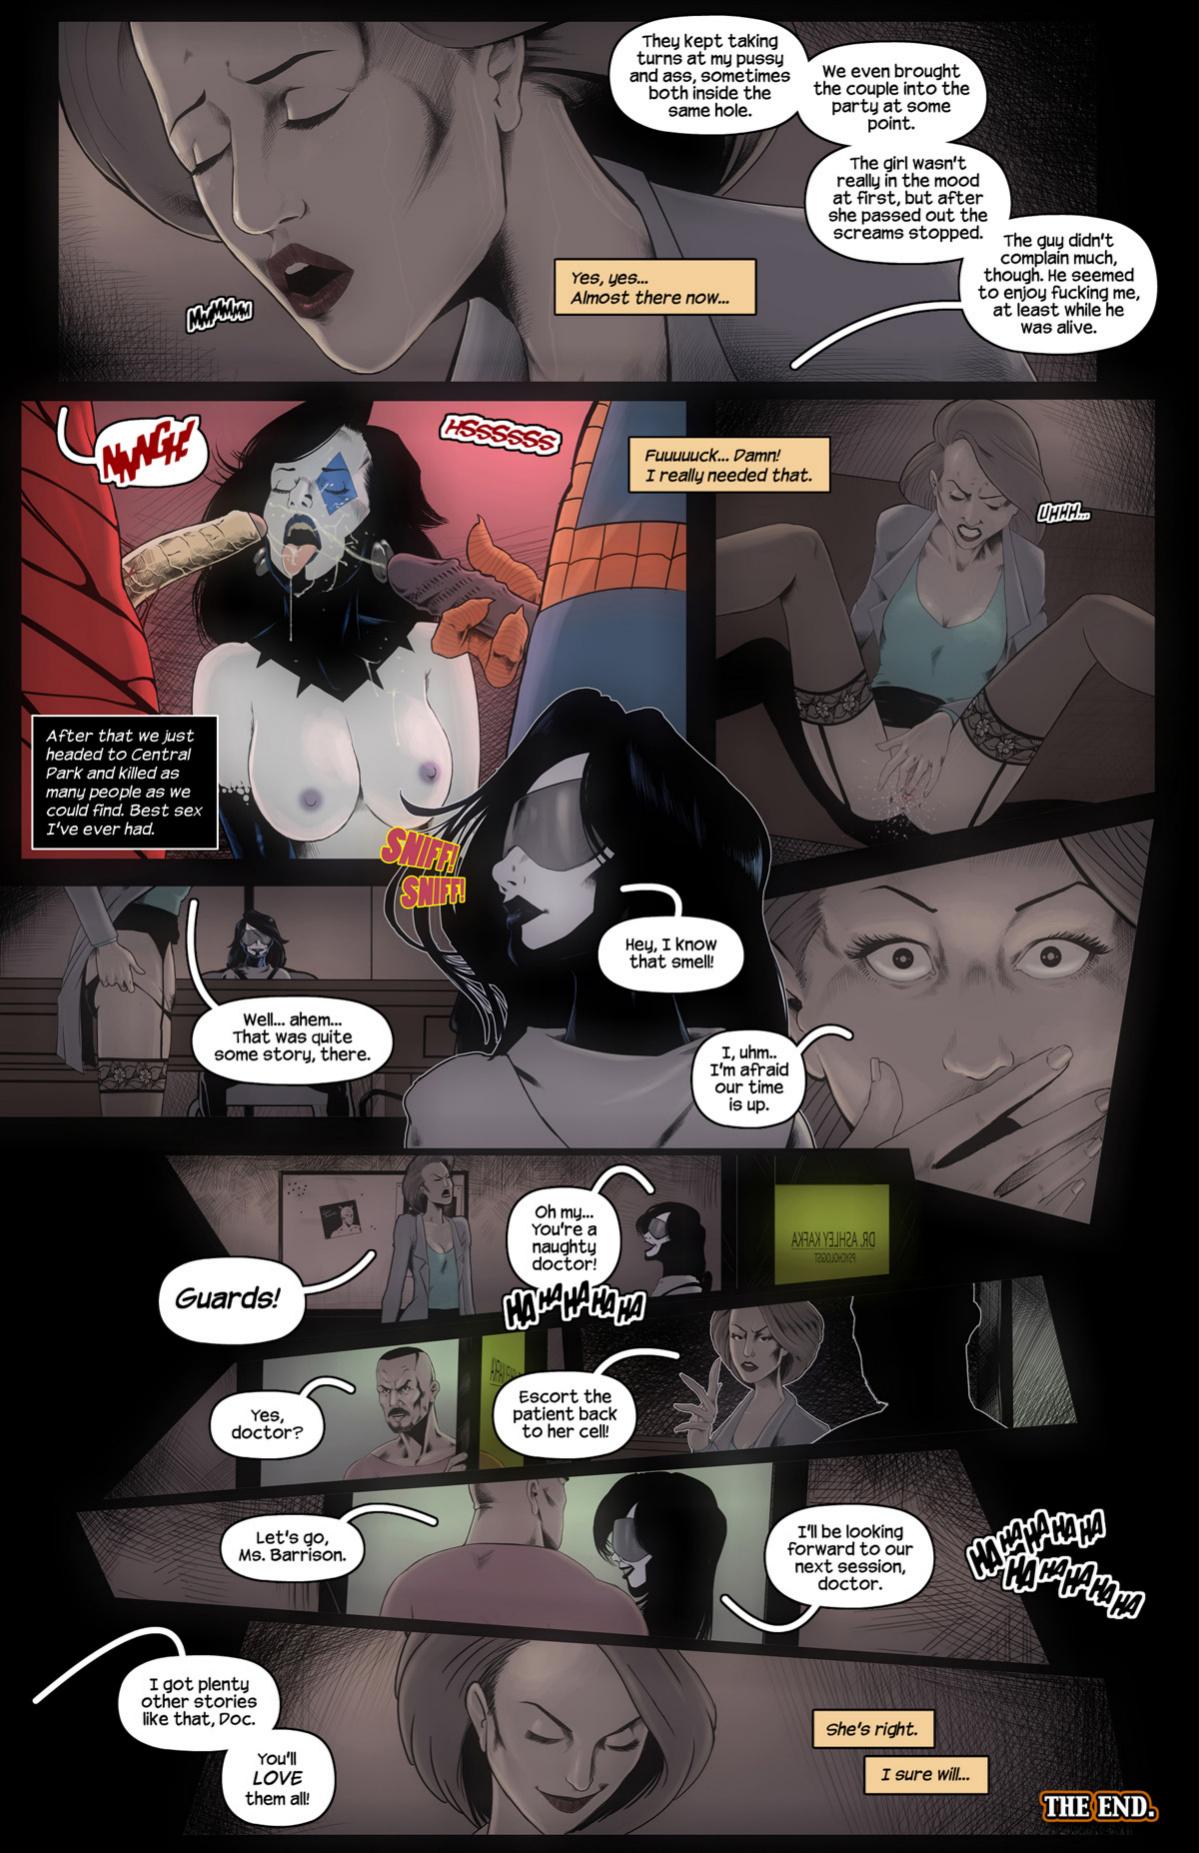 MAXIMUM CARNAGE porn comics Oral sex, Anal Sex, Double Penetration, Group Sex, Masturbation